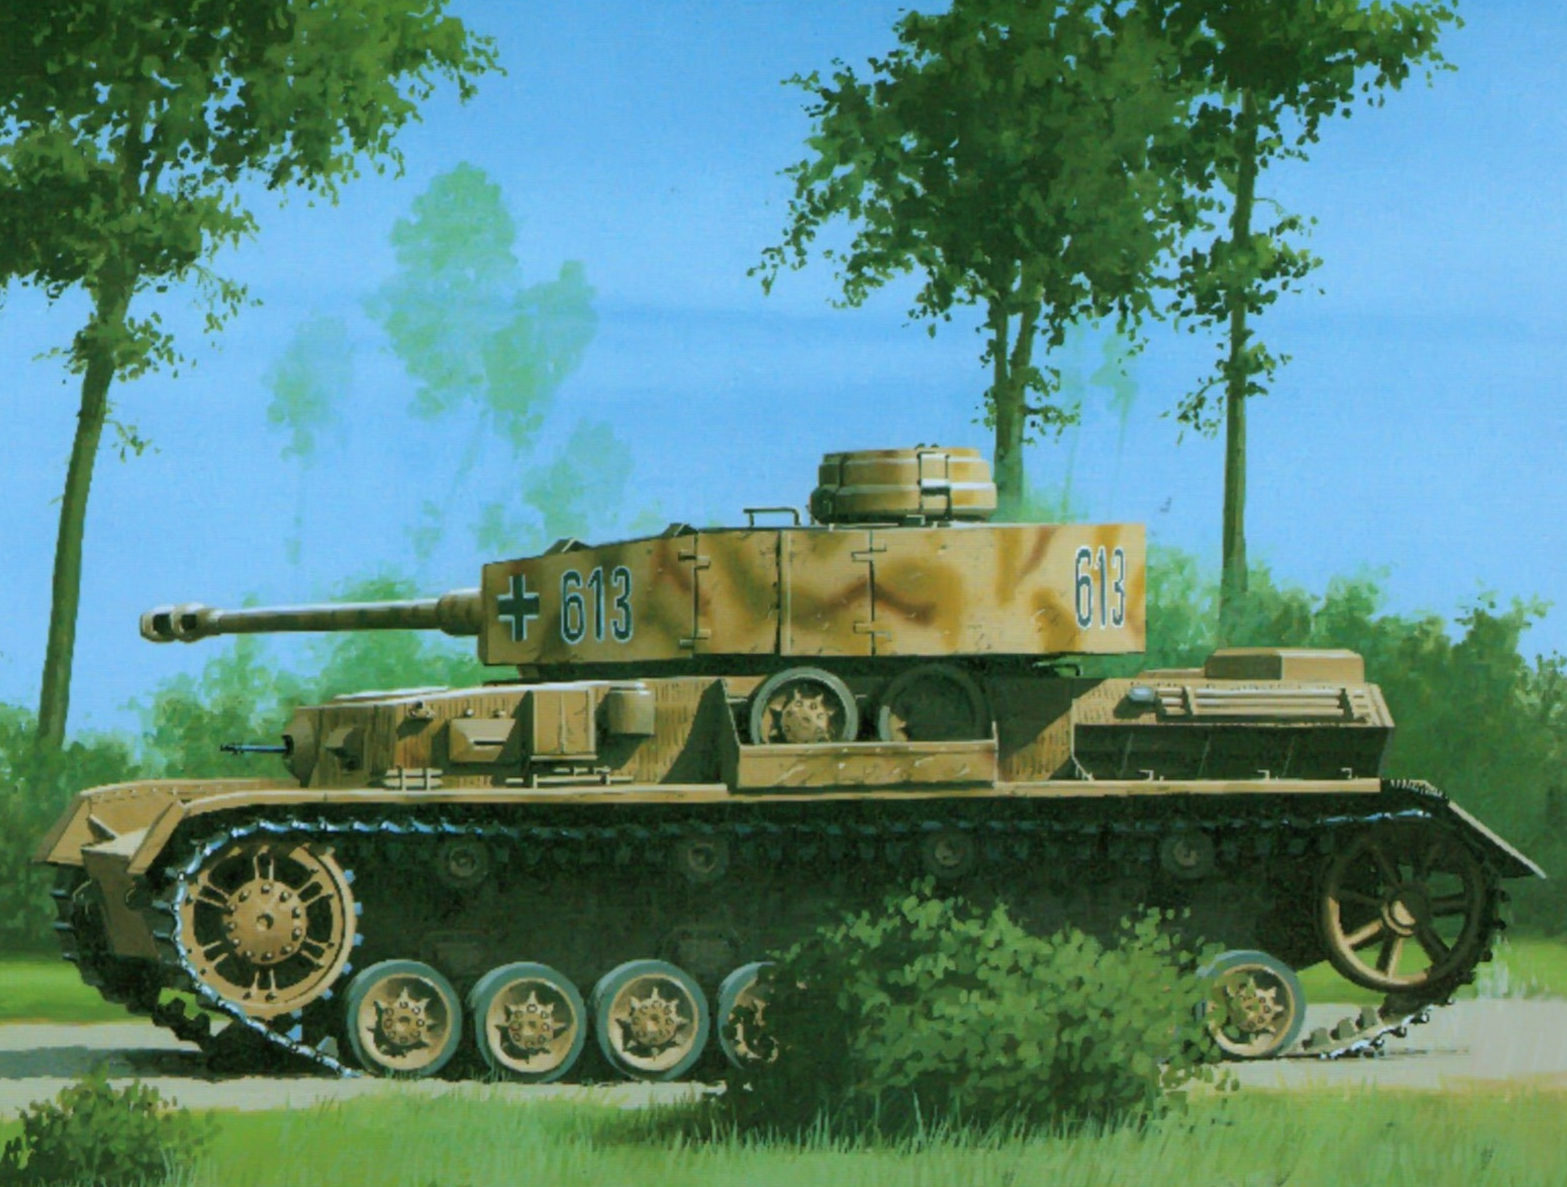 Wróbel Arkadiusz. Танк PzKpfw IV Ausf. H.